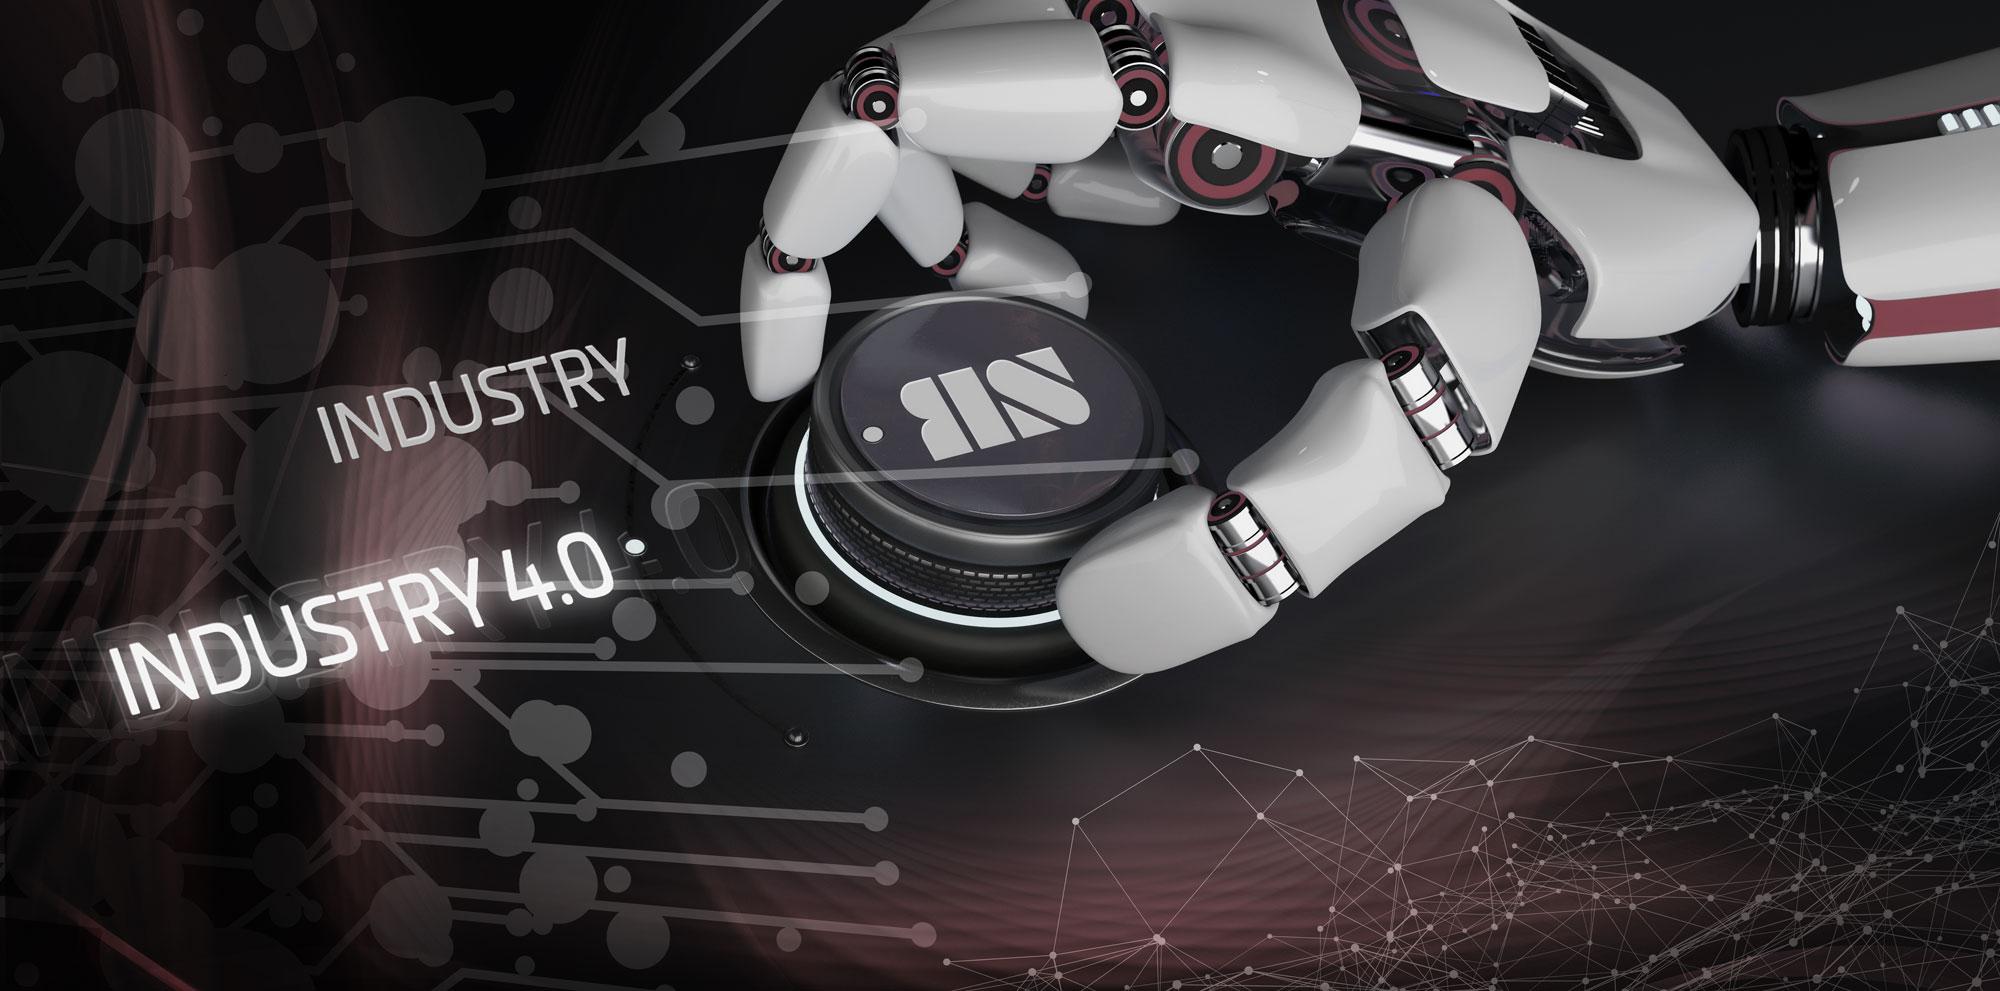 08-industry 4.0